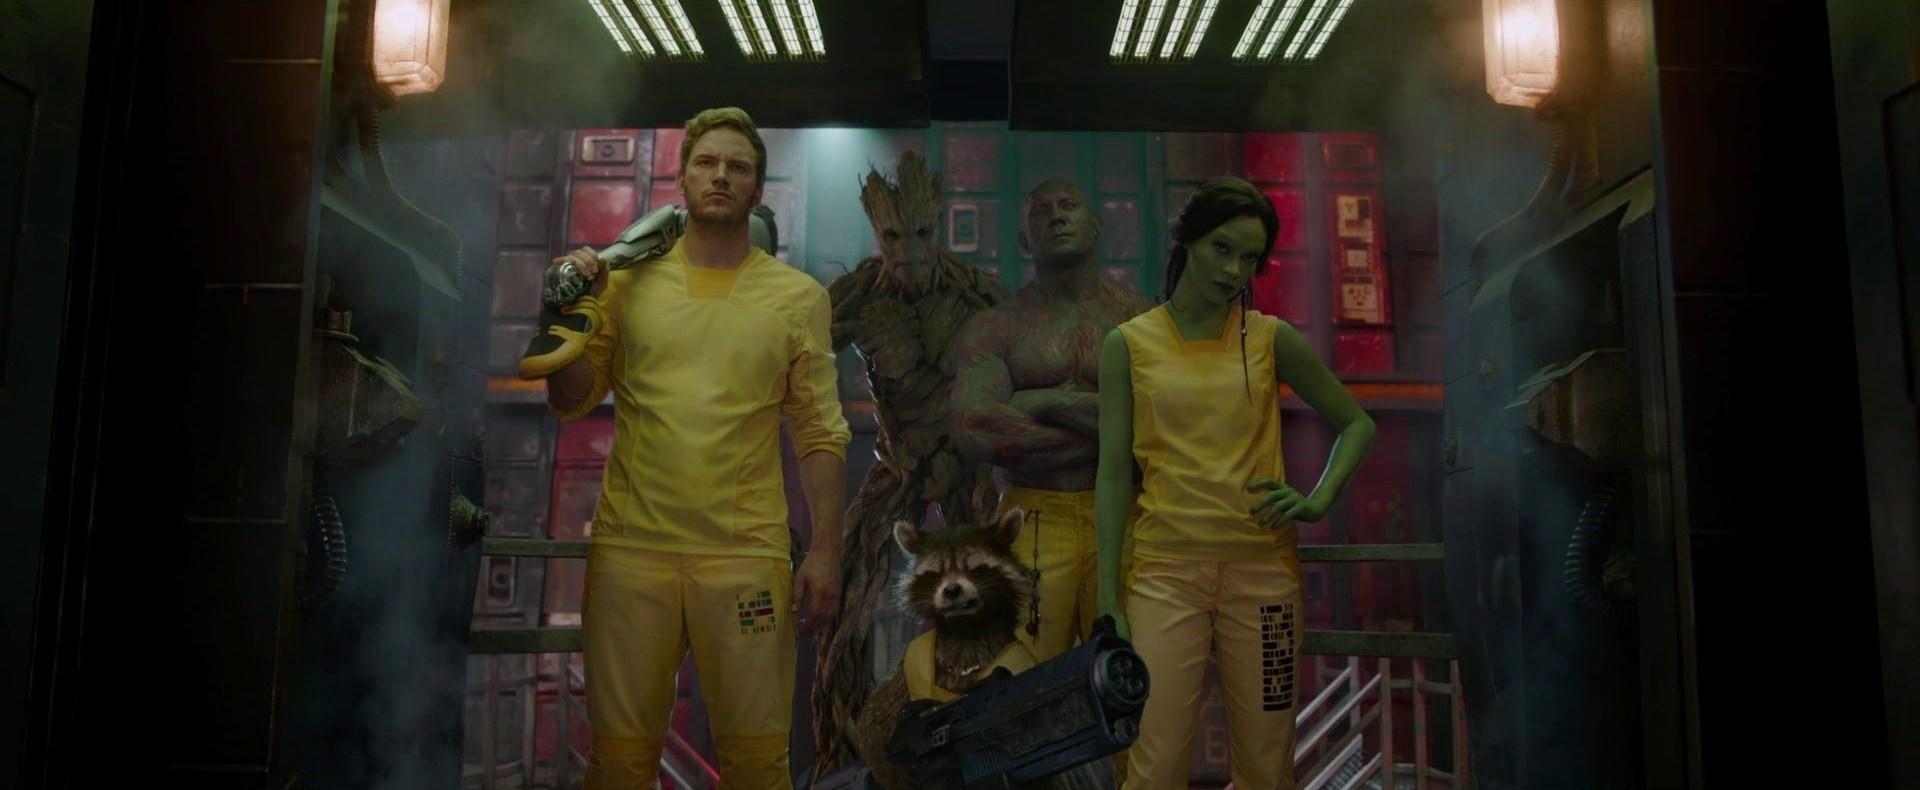 Galerie Les Gardiens de la Galaxie 7